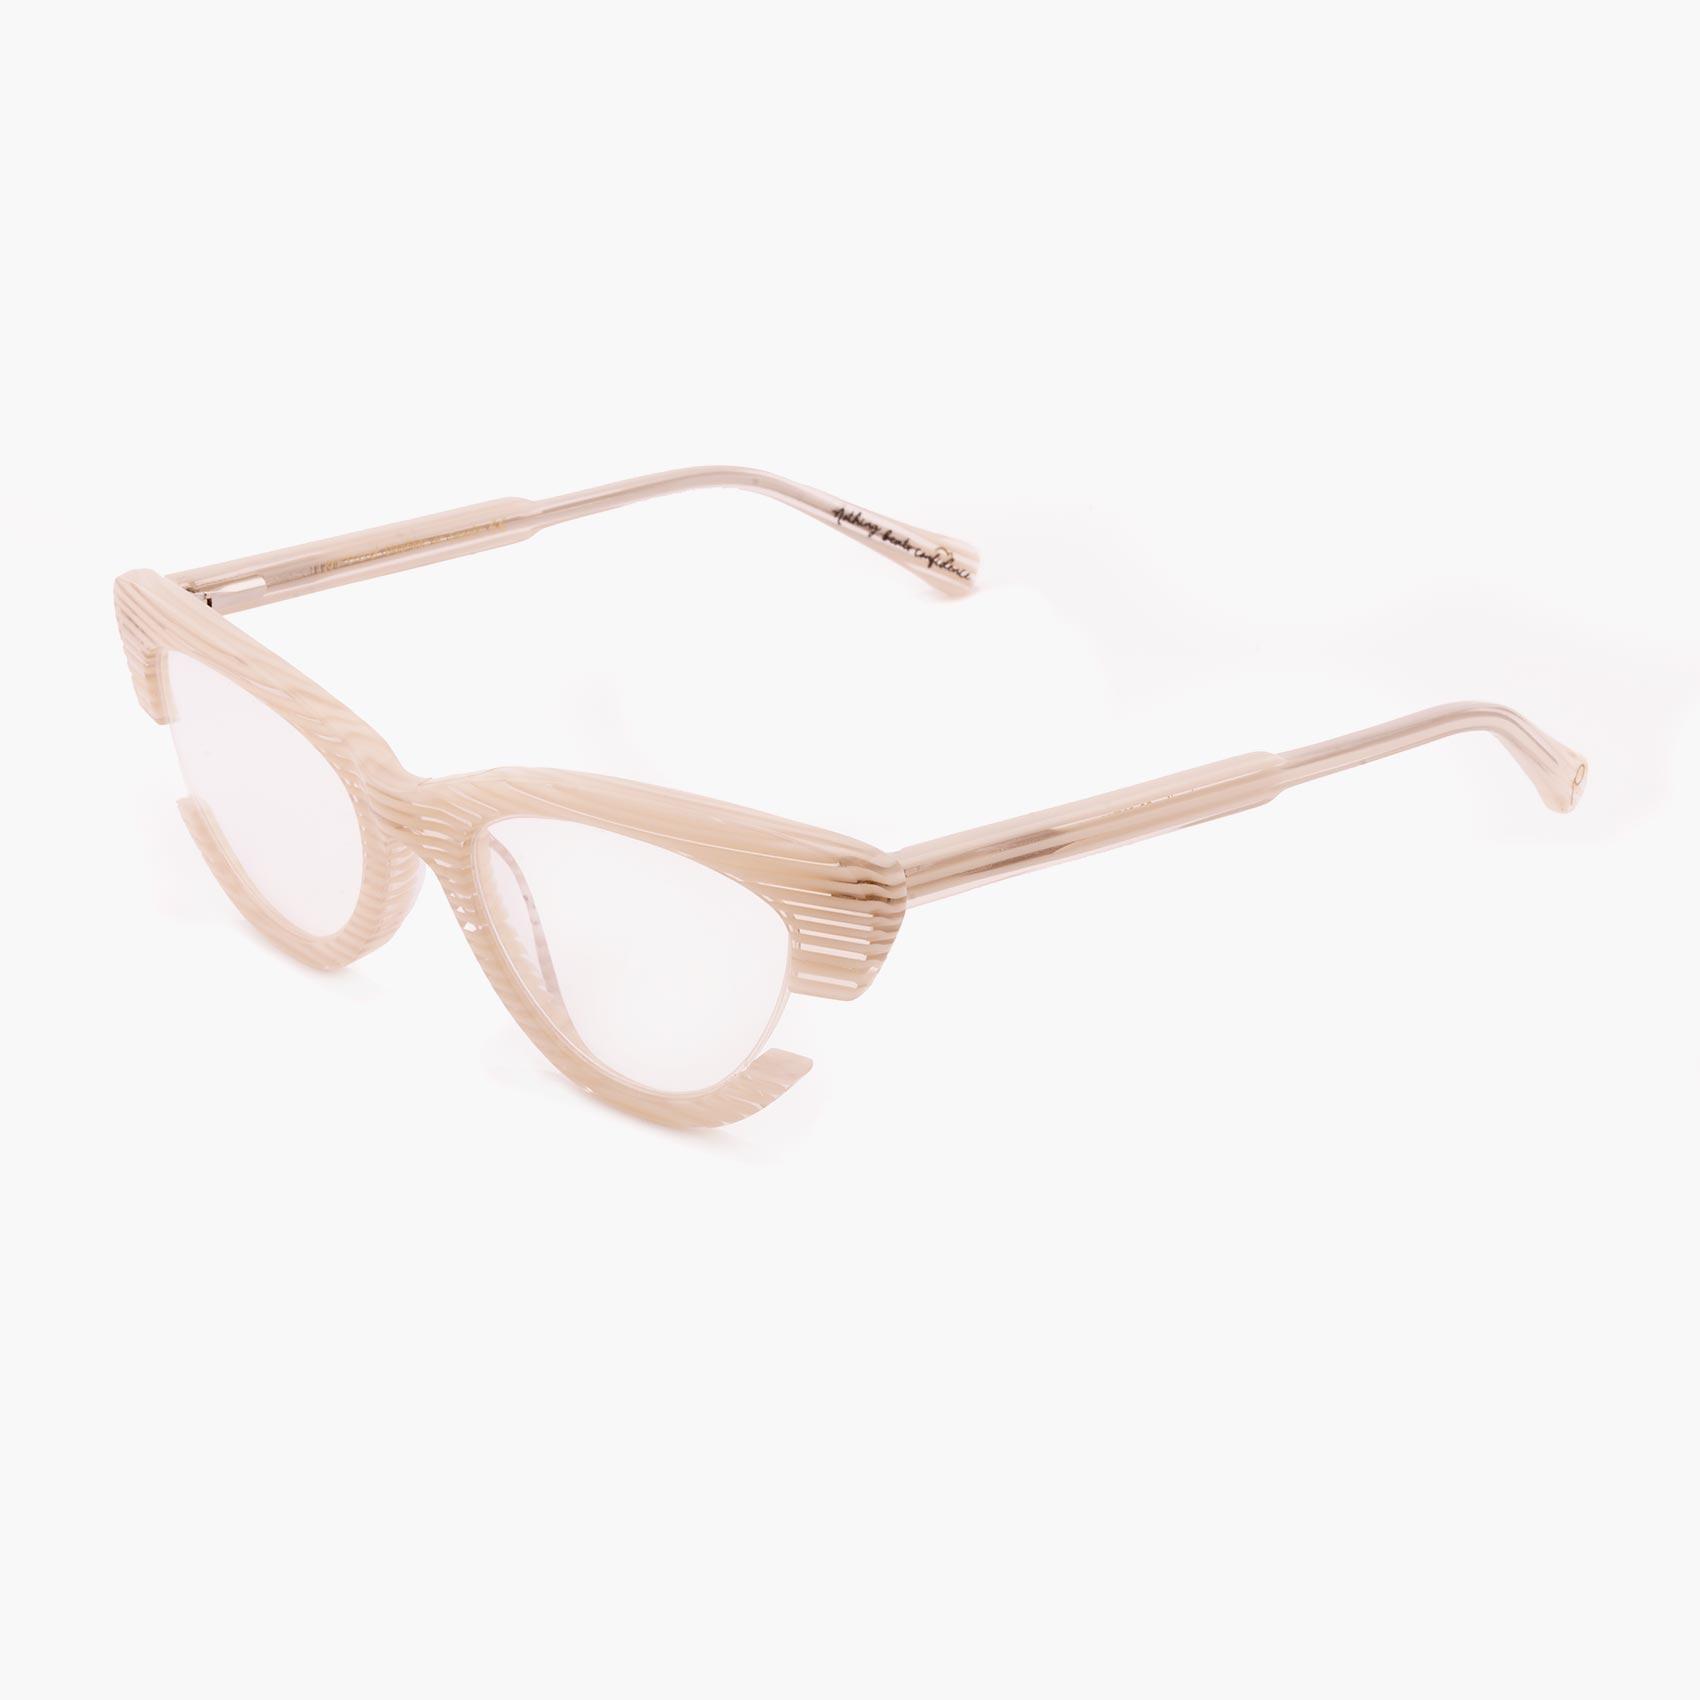 Proud eyewear Jennifer C2 P gafas de vista mujer